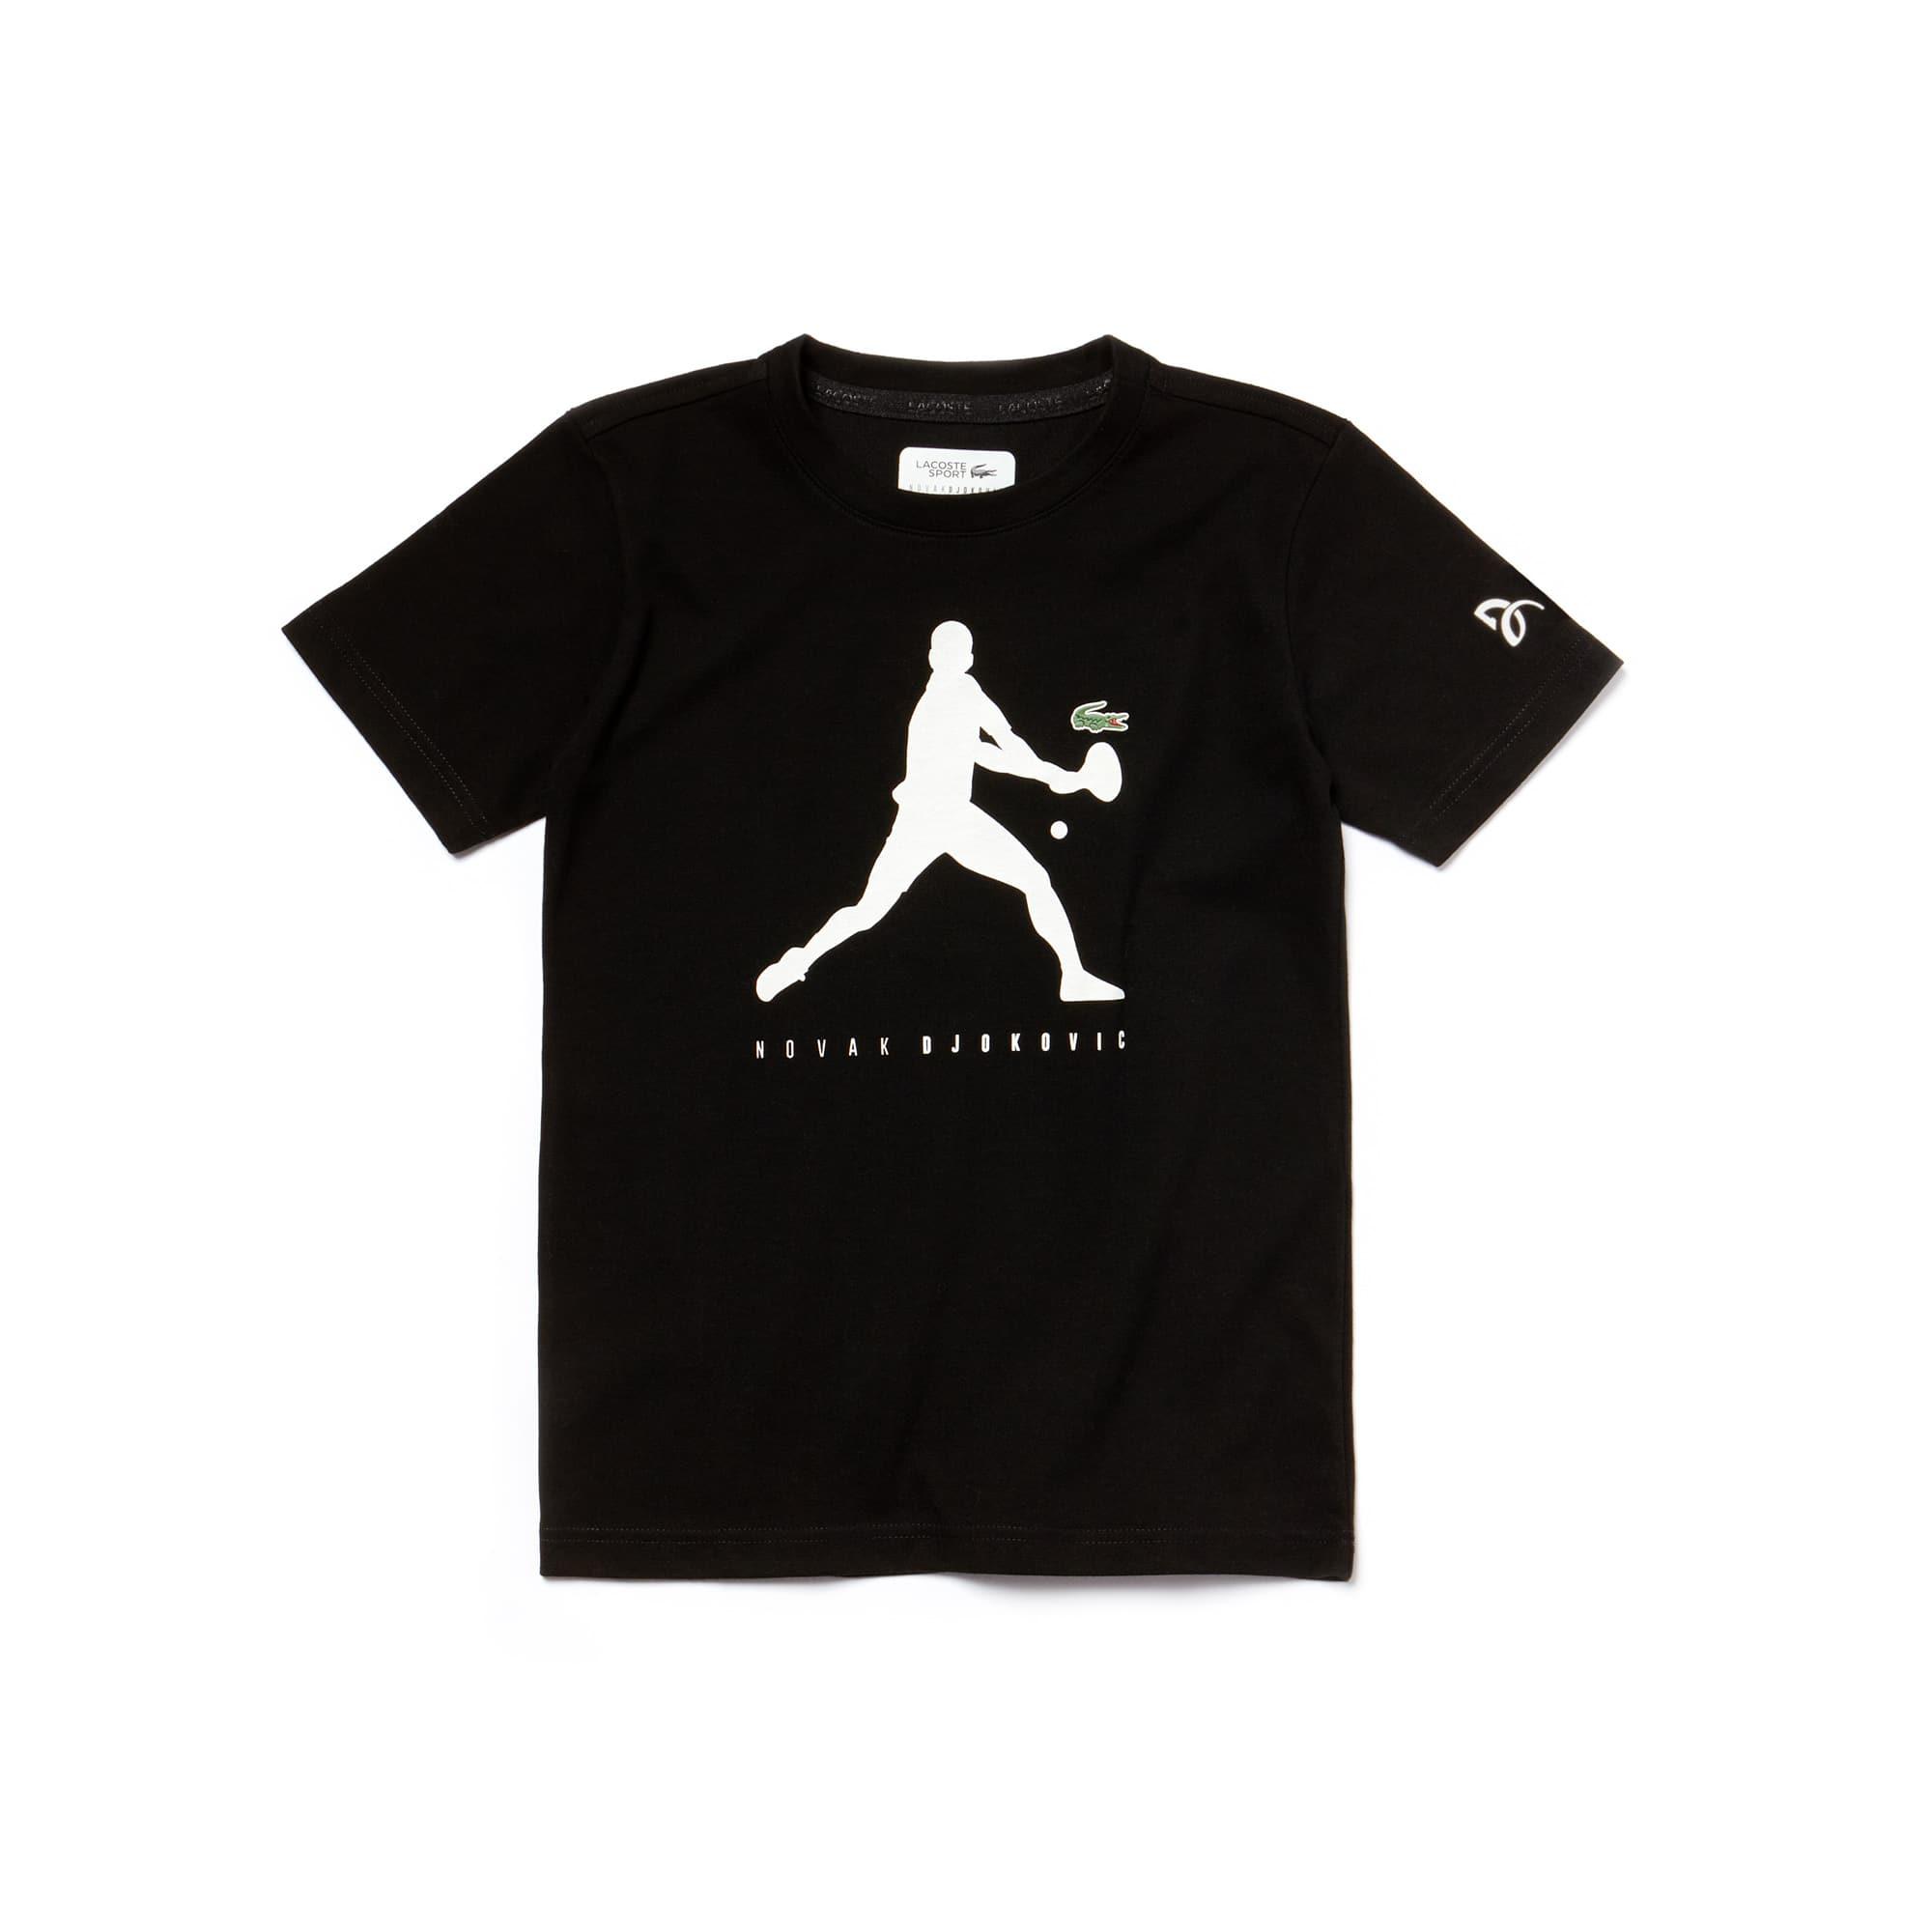 Boys' SPORT Technical Jersey T-shirt - Novak Djokovic Supporter Collection